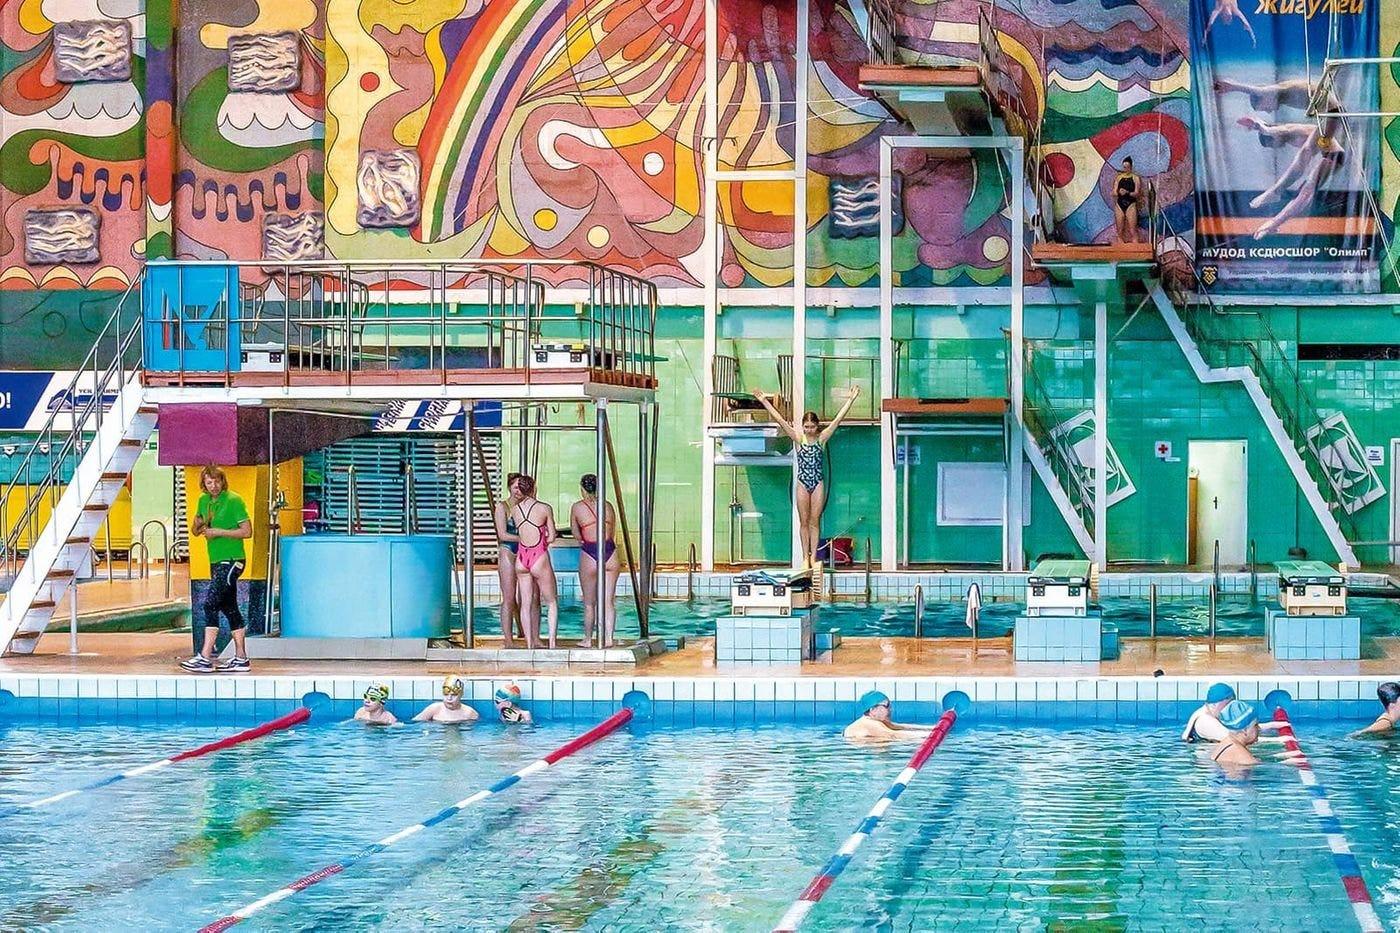 Soviet mosaic inside the 'Olymp' swimming pool in Tolyatti